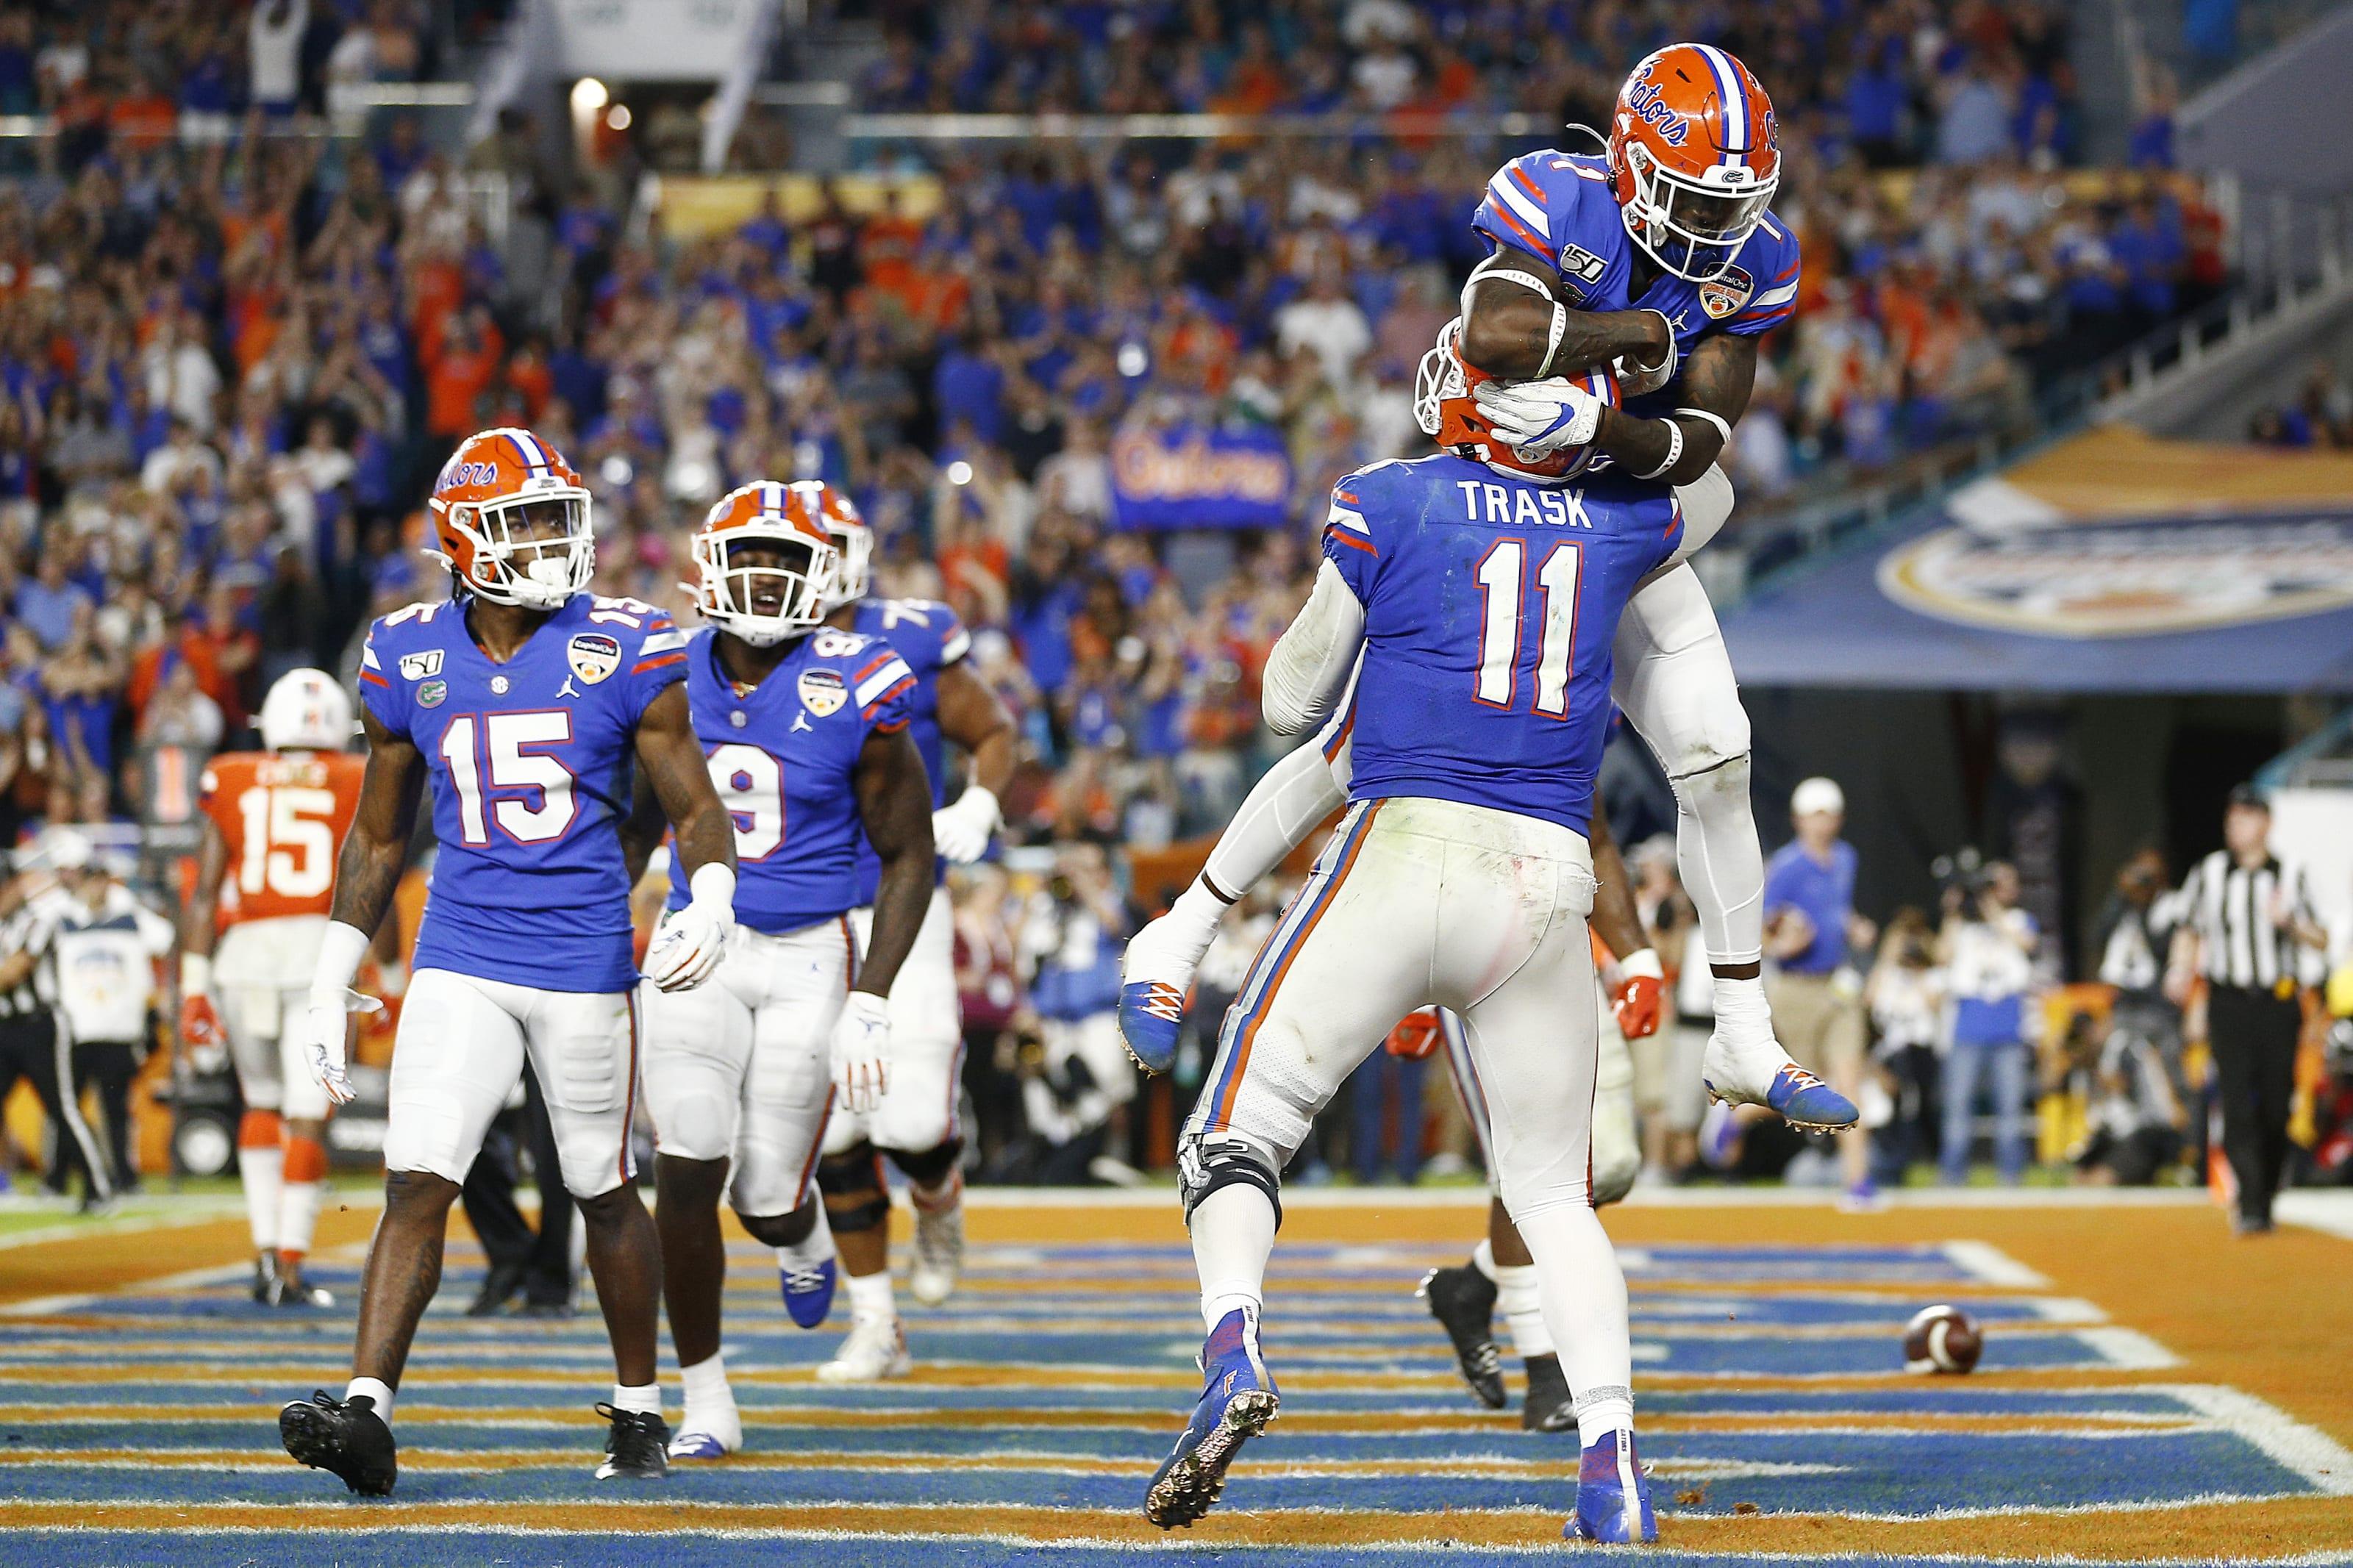 Florida Football 3 Biggest Surprises From Gators 2019 Season Page 3